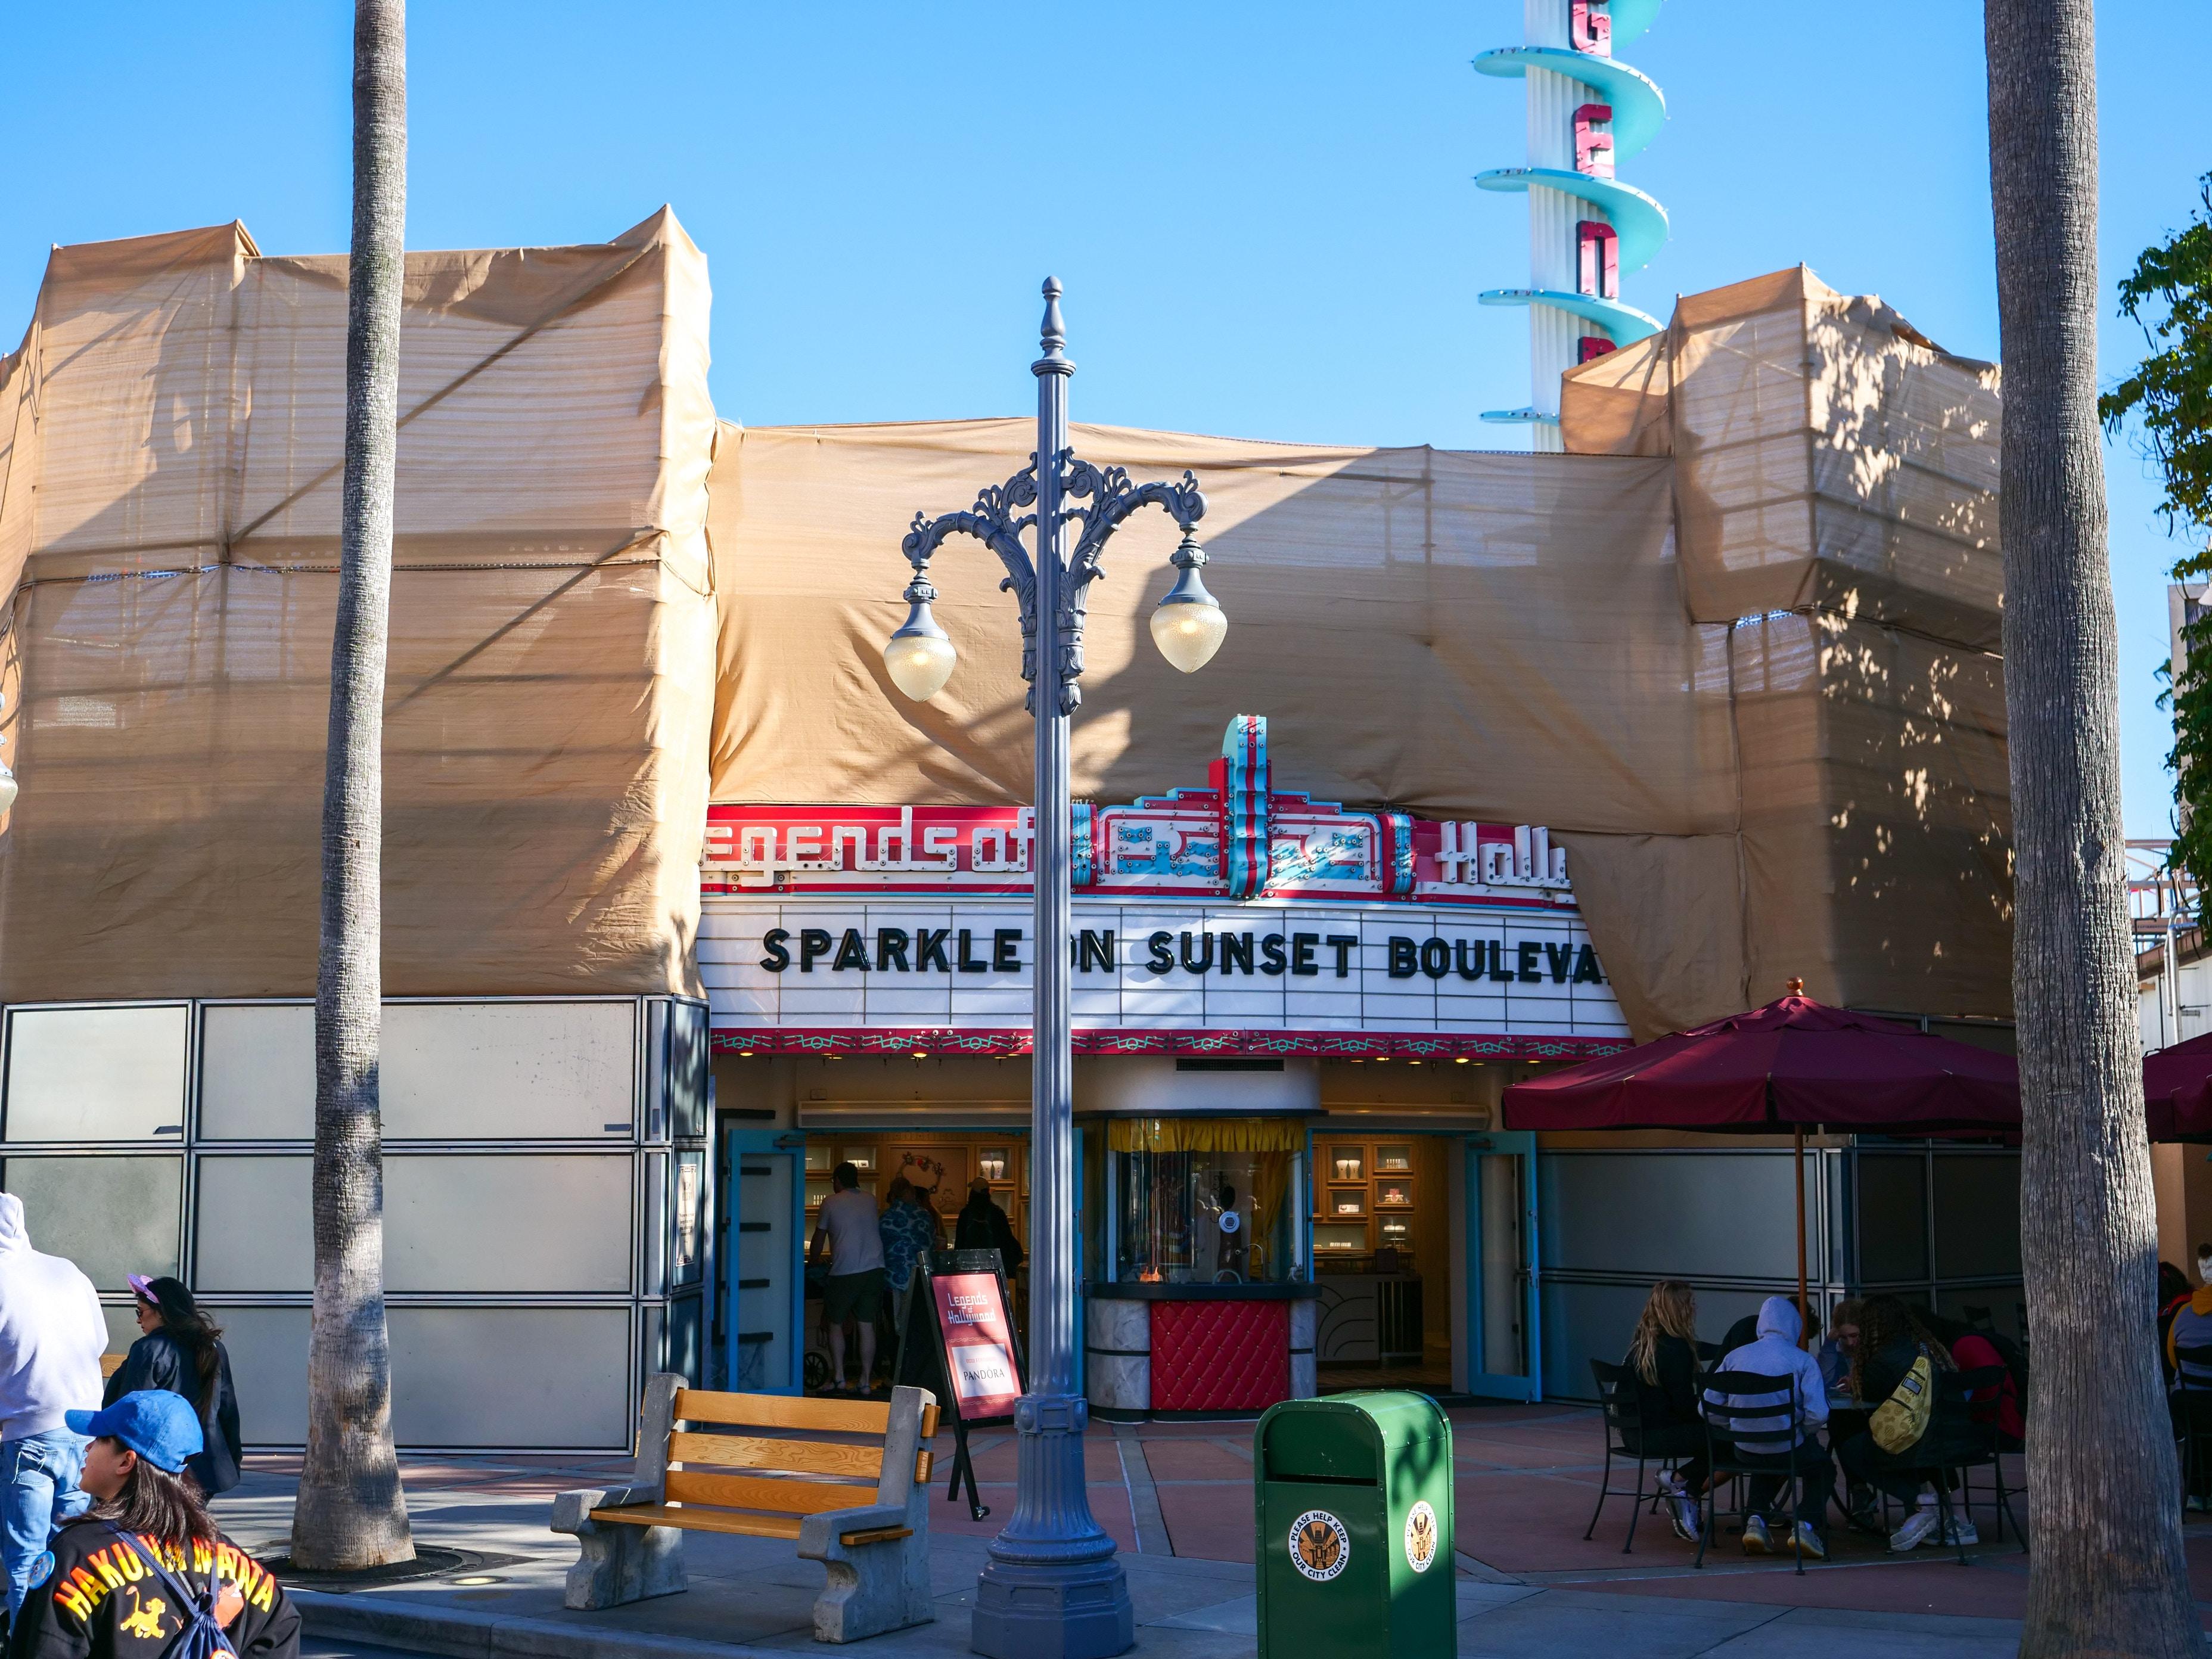 Exterior Refurbishment at Legends of Hollywood